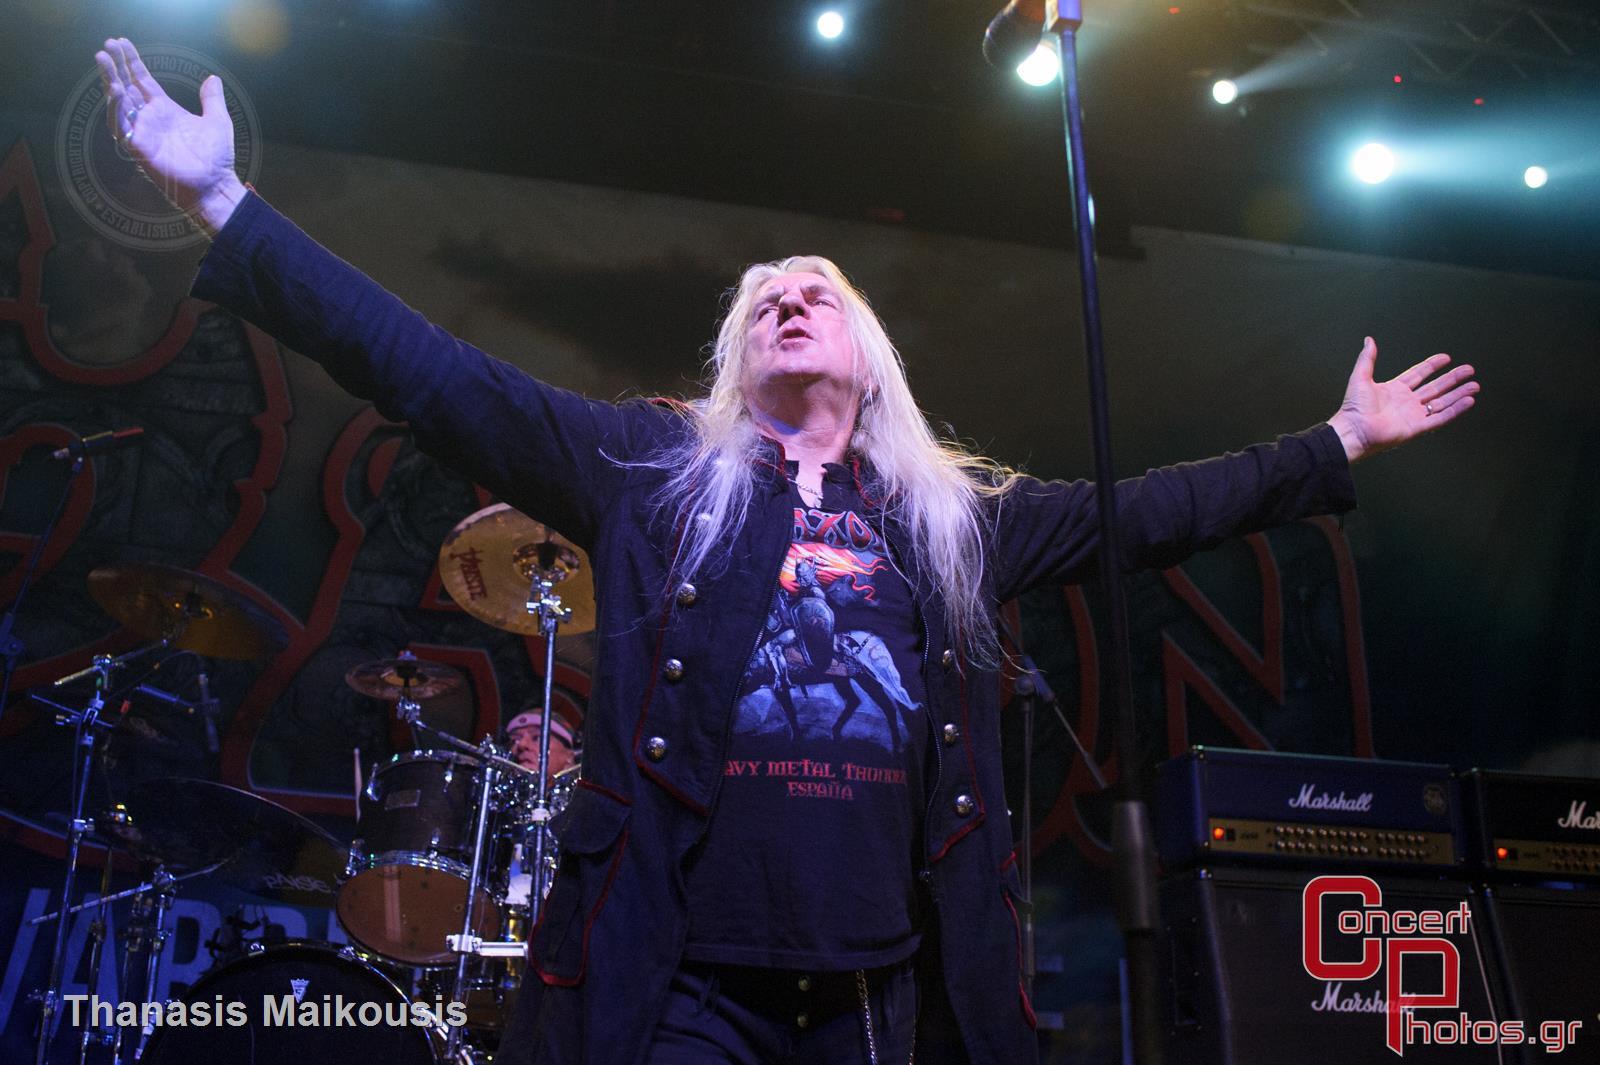 Saxon & Innerwish -Saxon Innerwish Gagarin photographer: Thanasis Maikousis - concertphotos_20141025_22_35_35